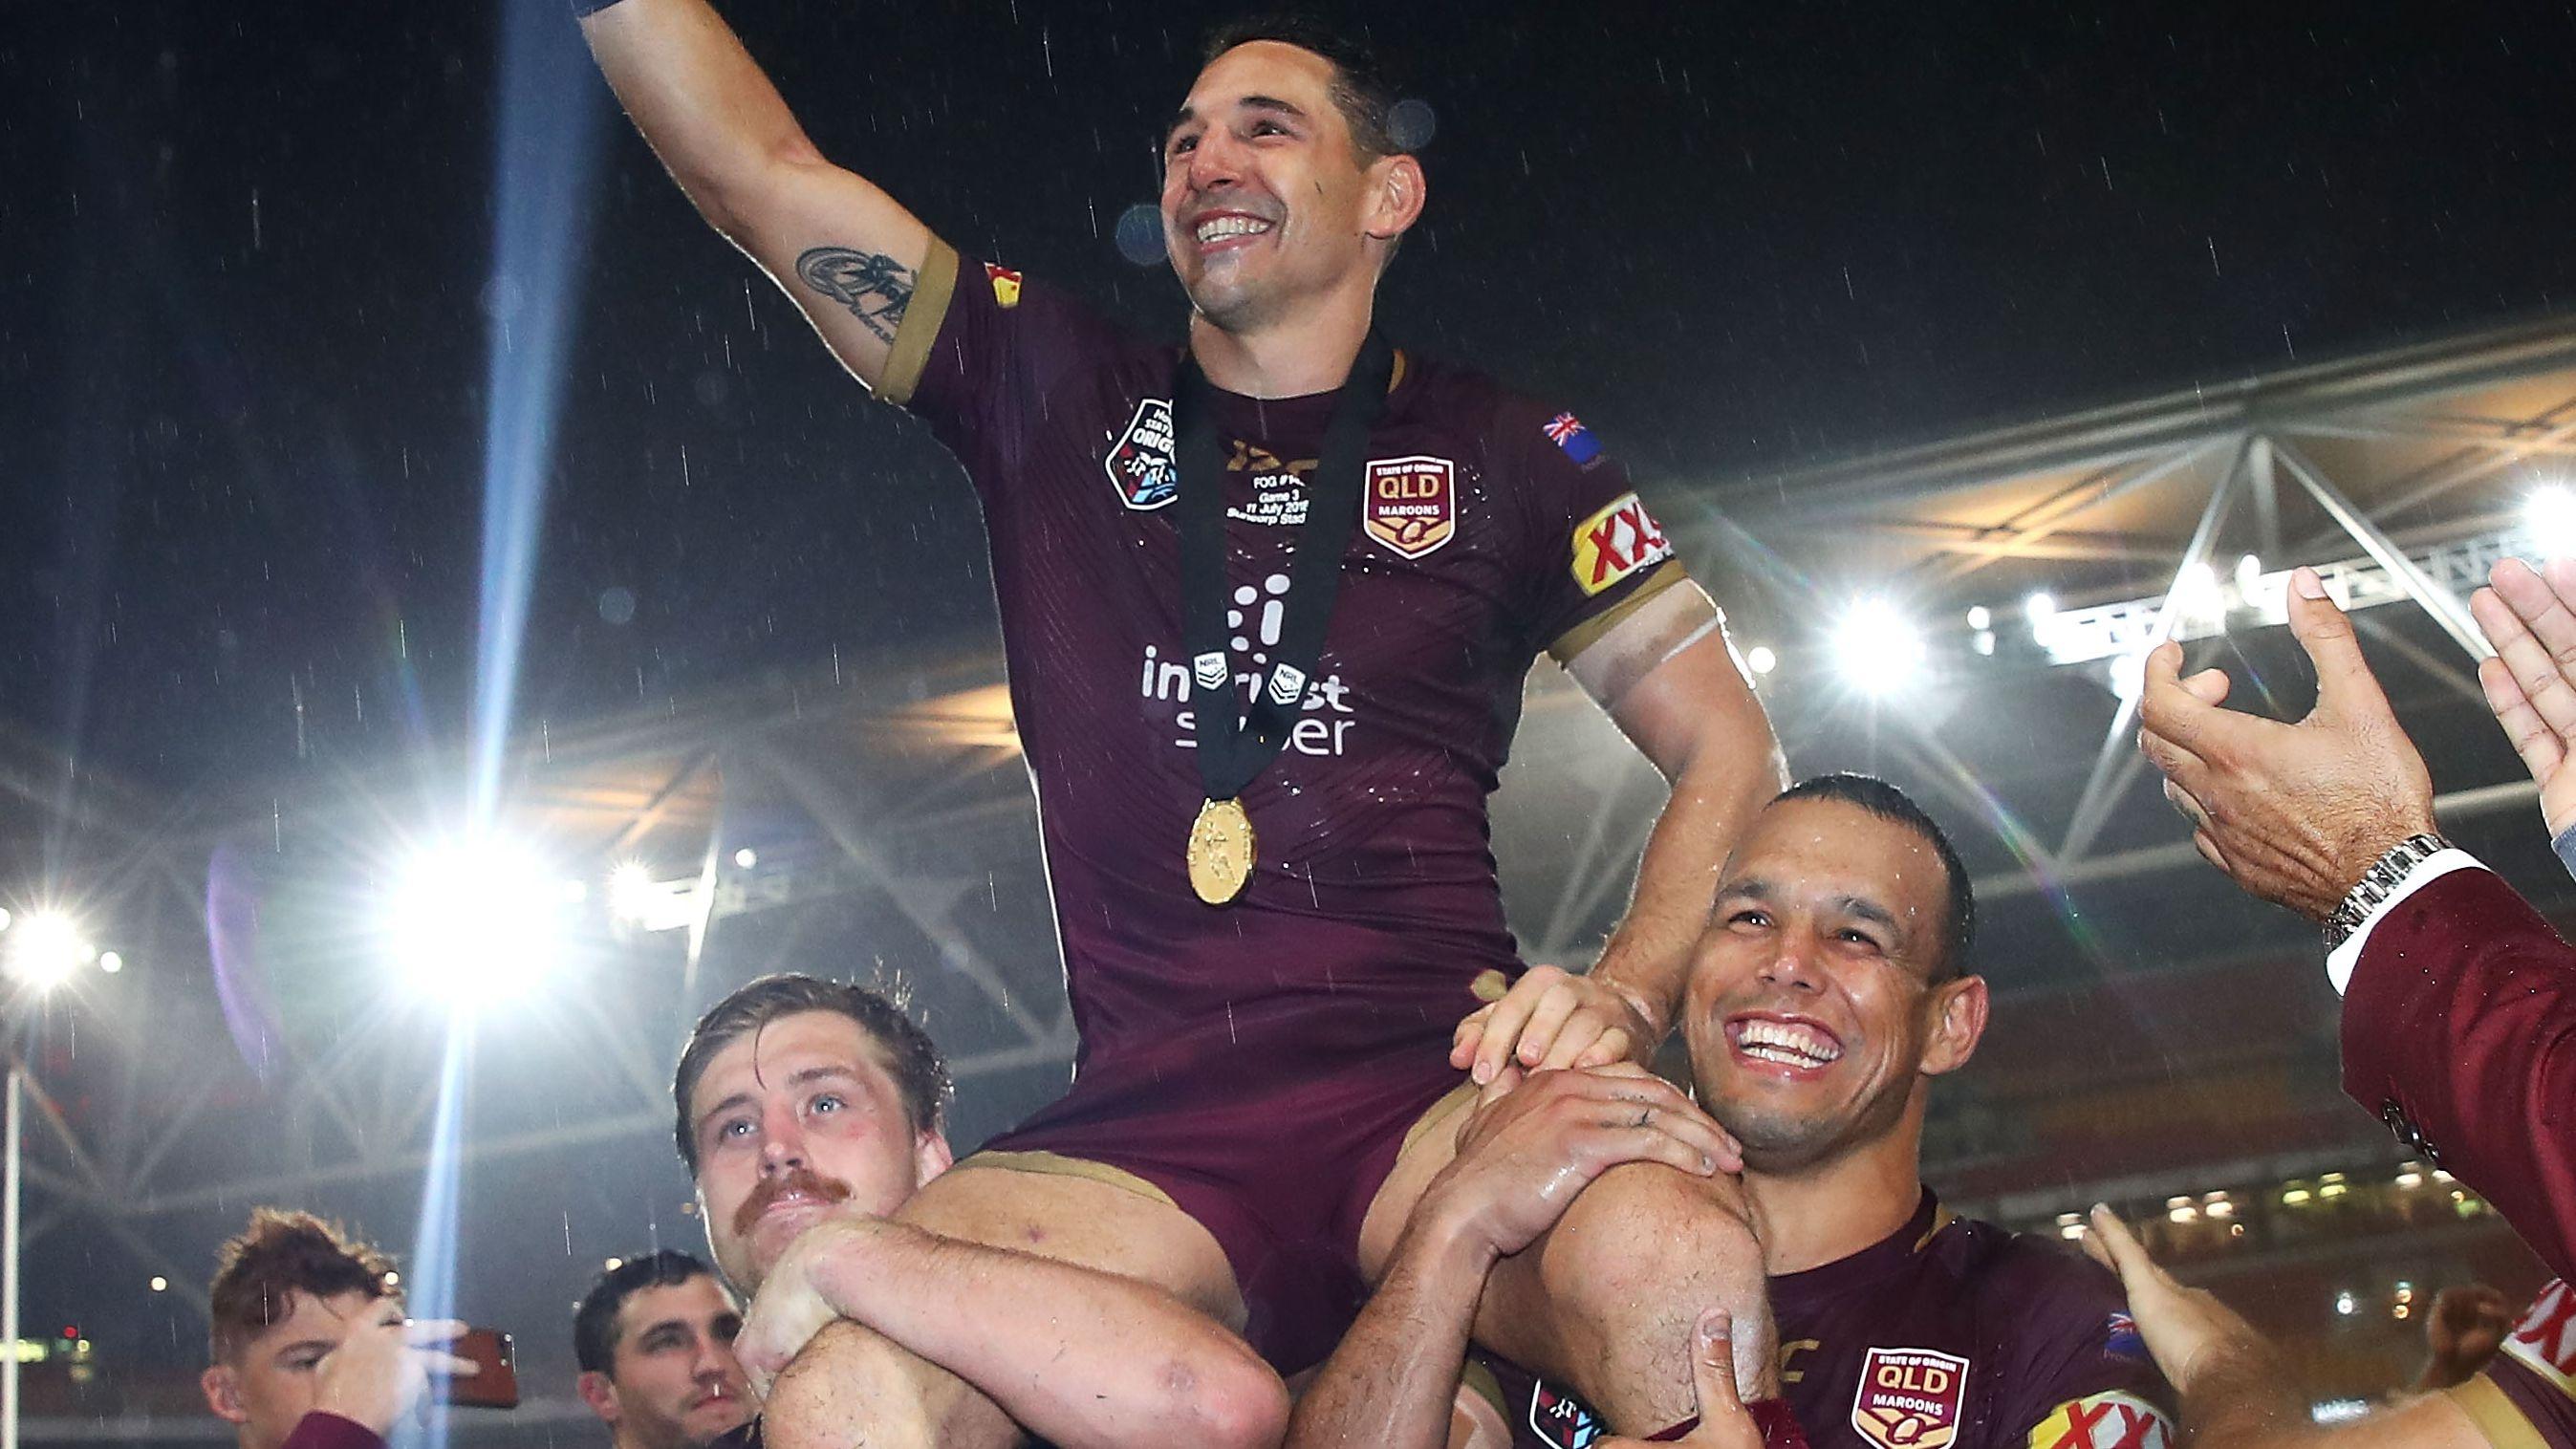 Billy Slater will coach Queensland.